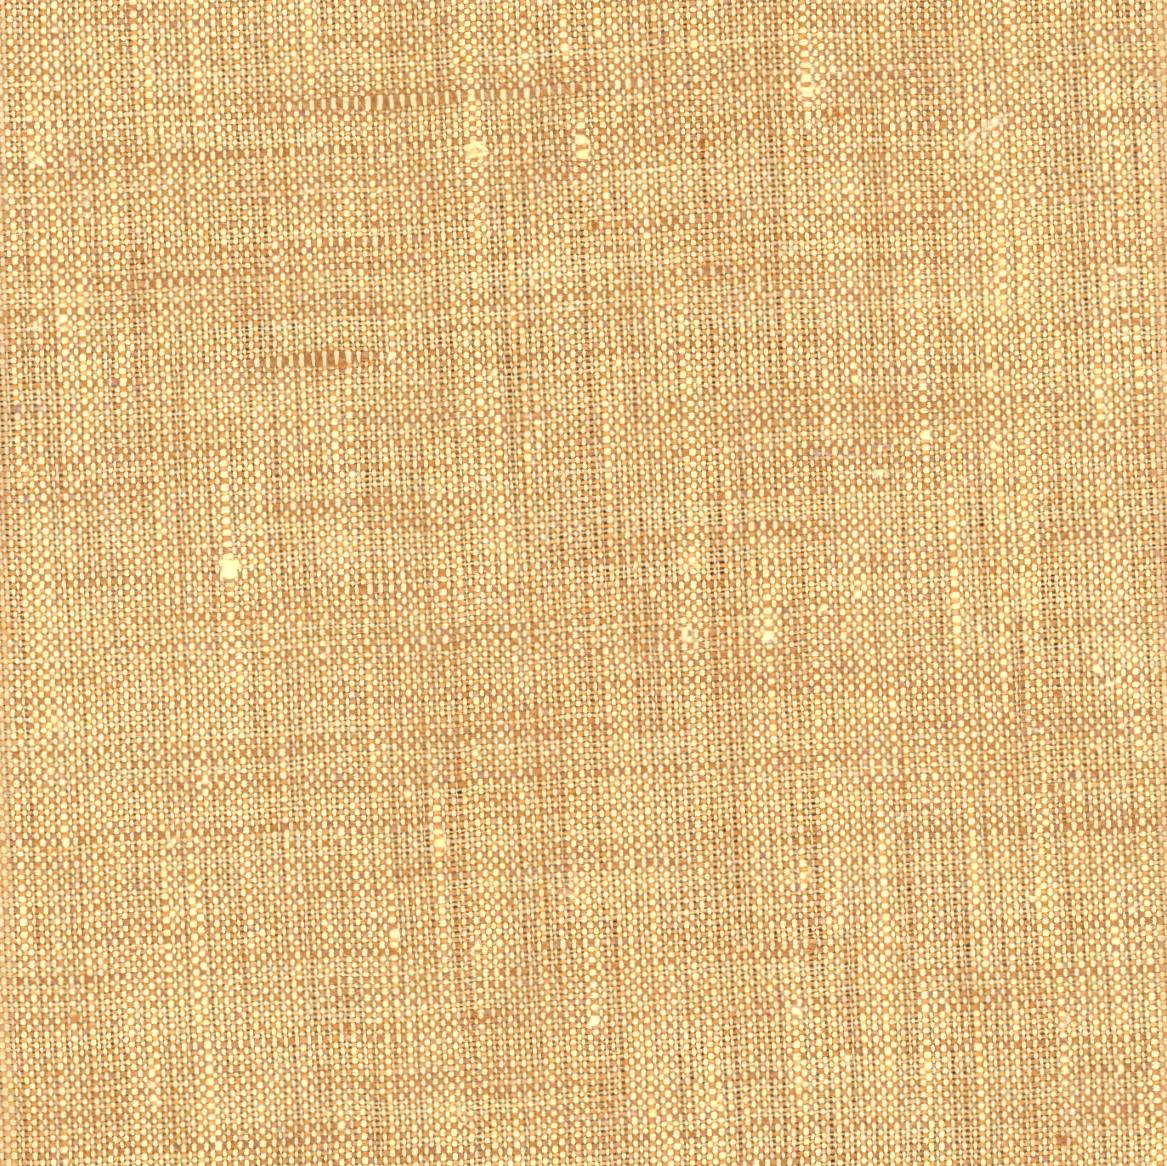 CERRO Beige/Cinnamon